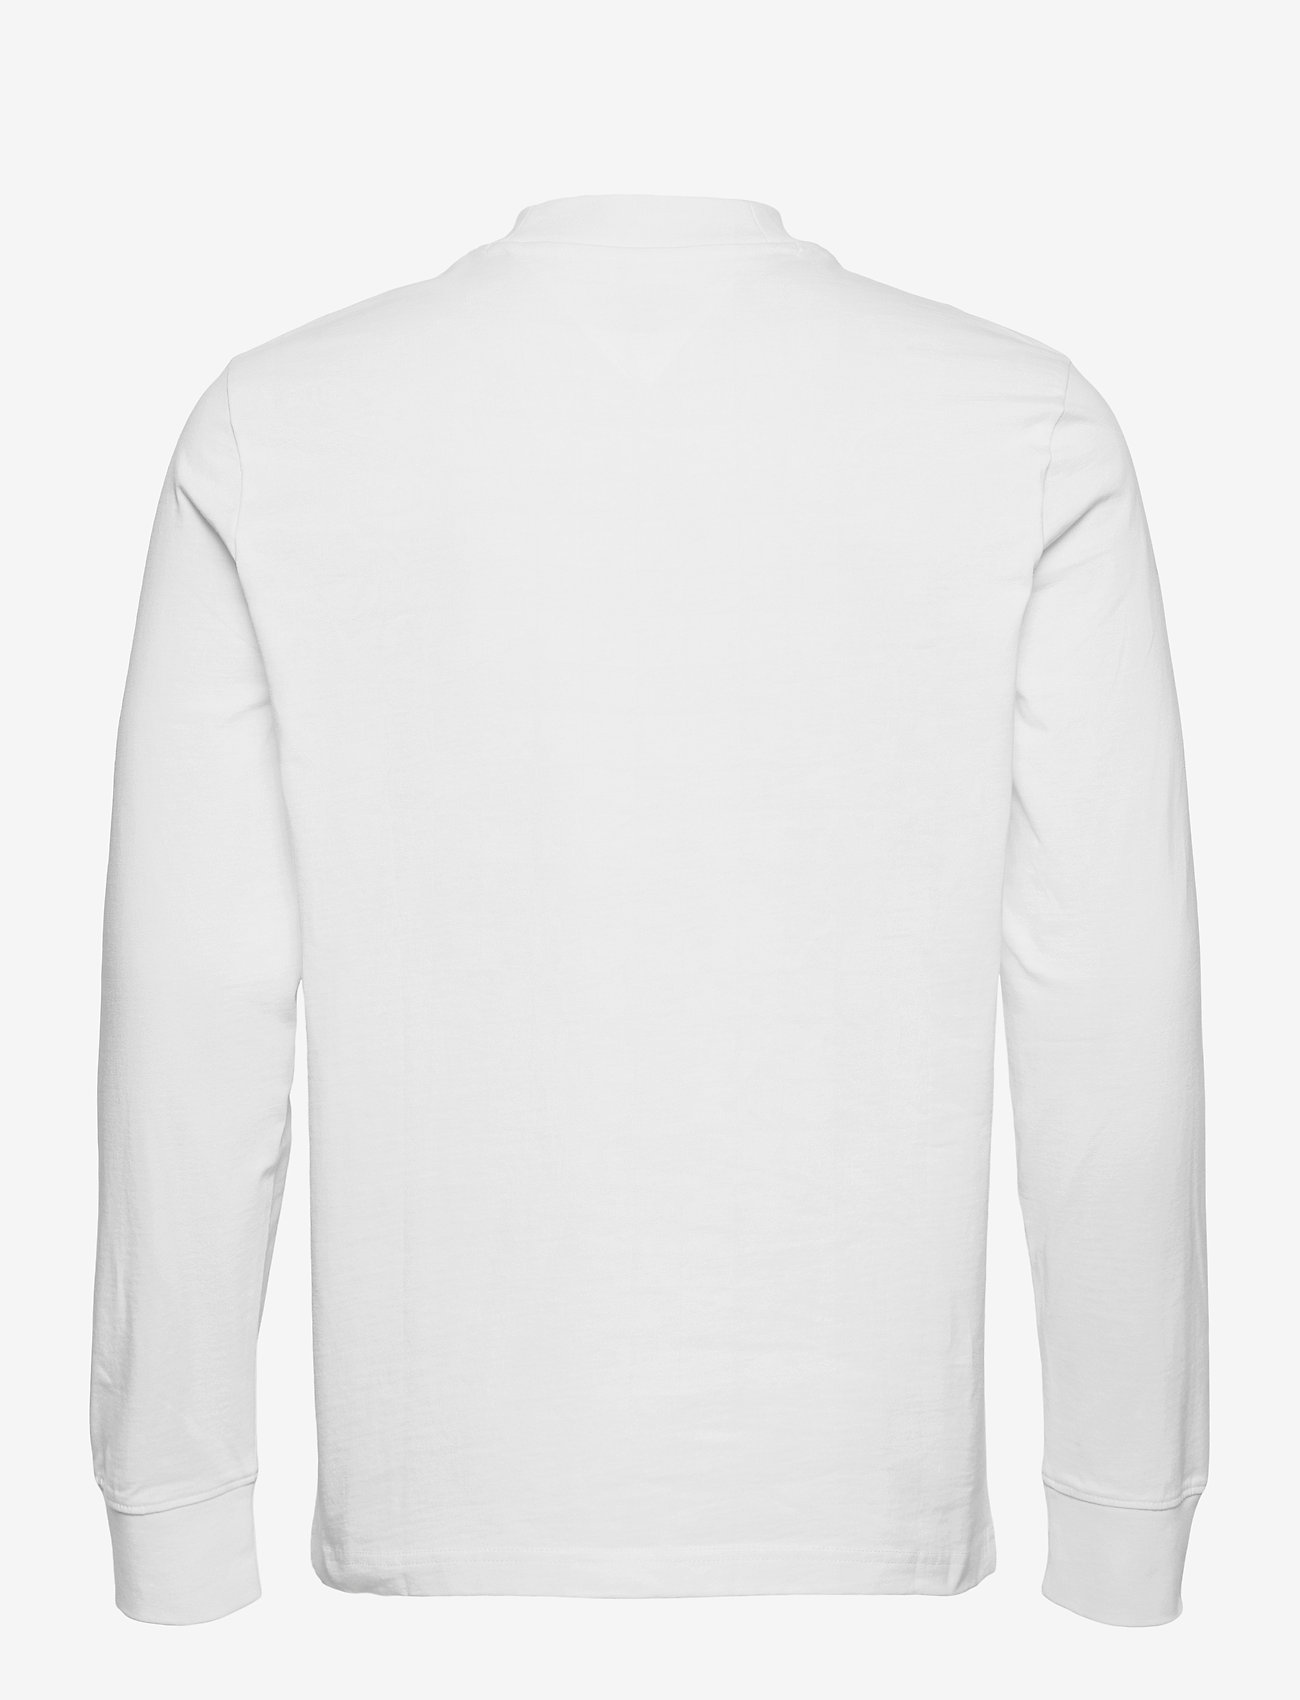 Tommy Jeans - TJM BADGE MOCK NECK LONGSLEEVE - basic t-shirts - white - 1